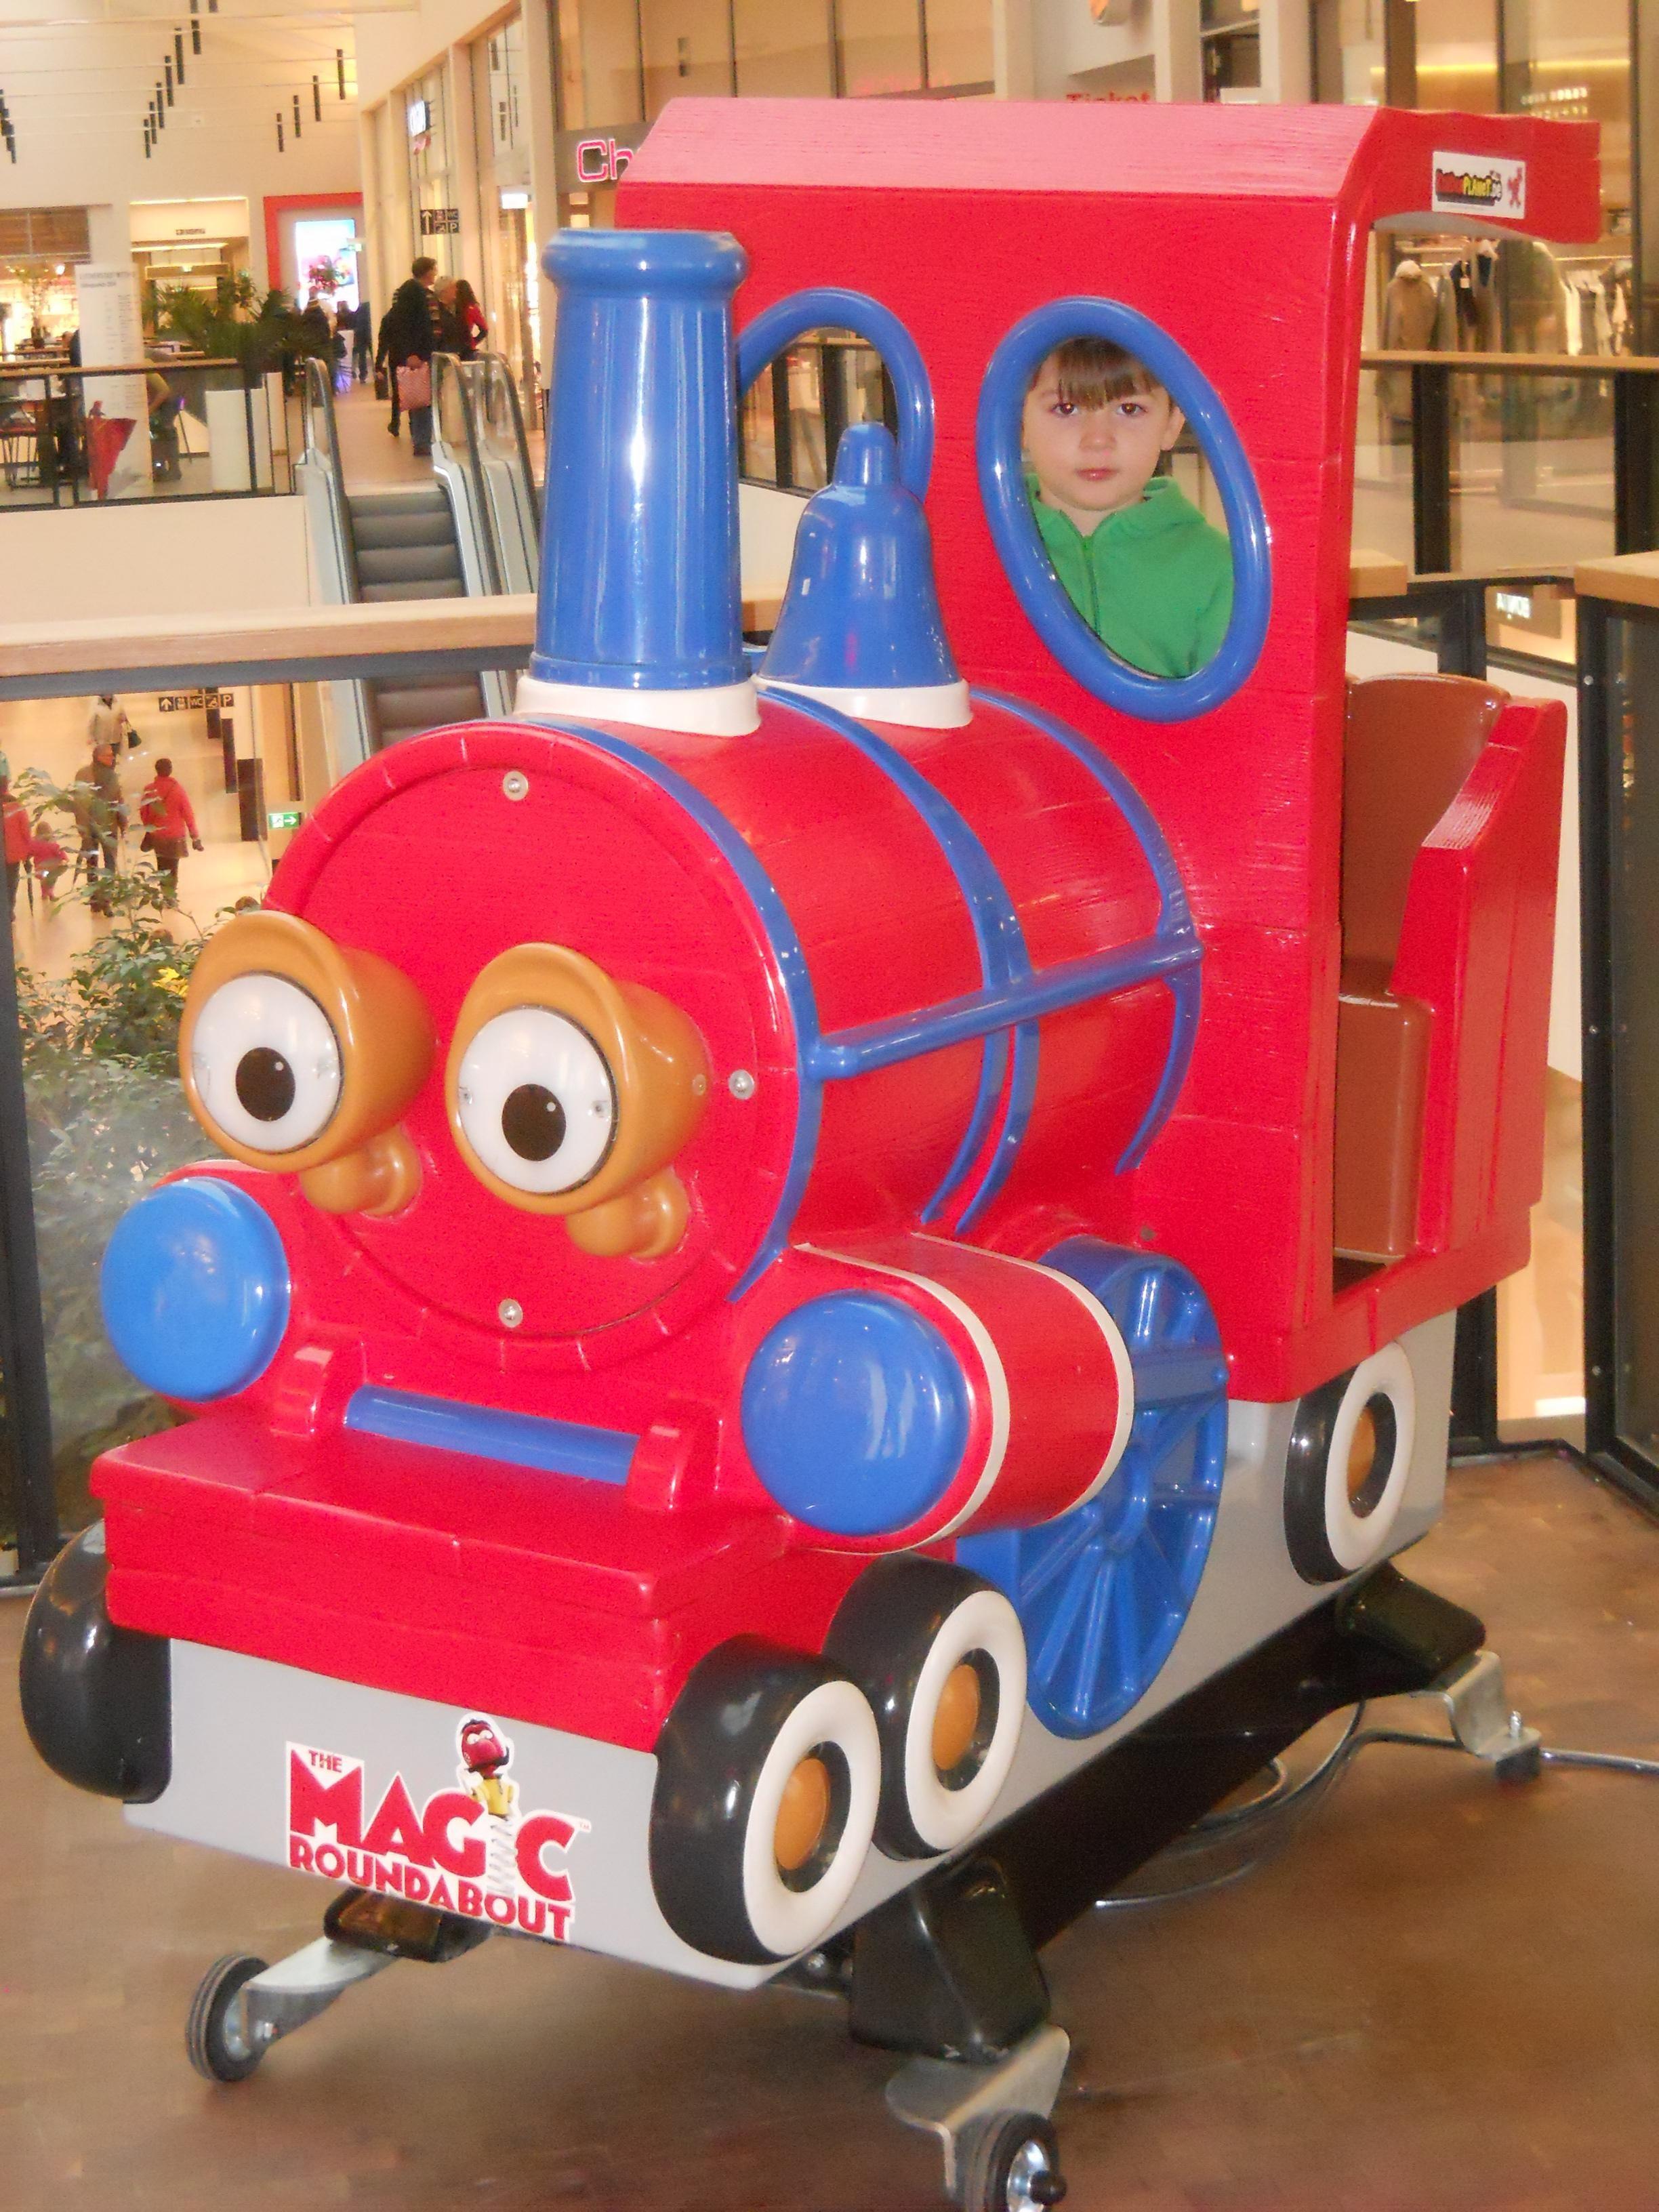 Kinderplanet Magic Roundabout Train